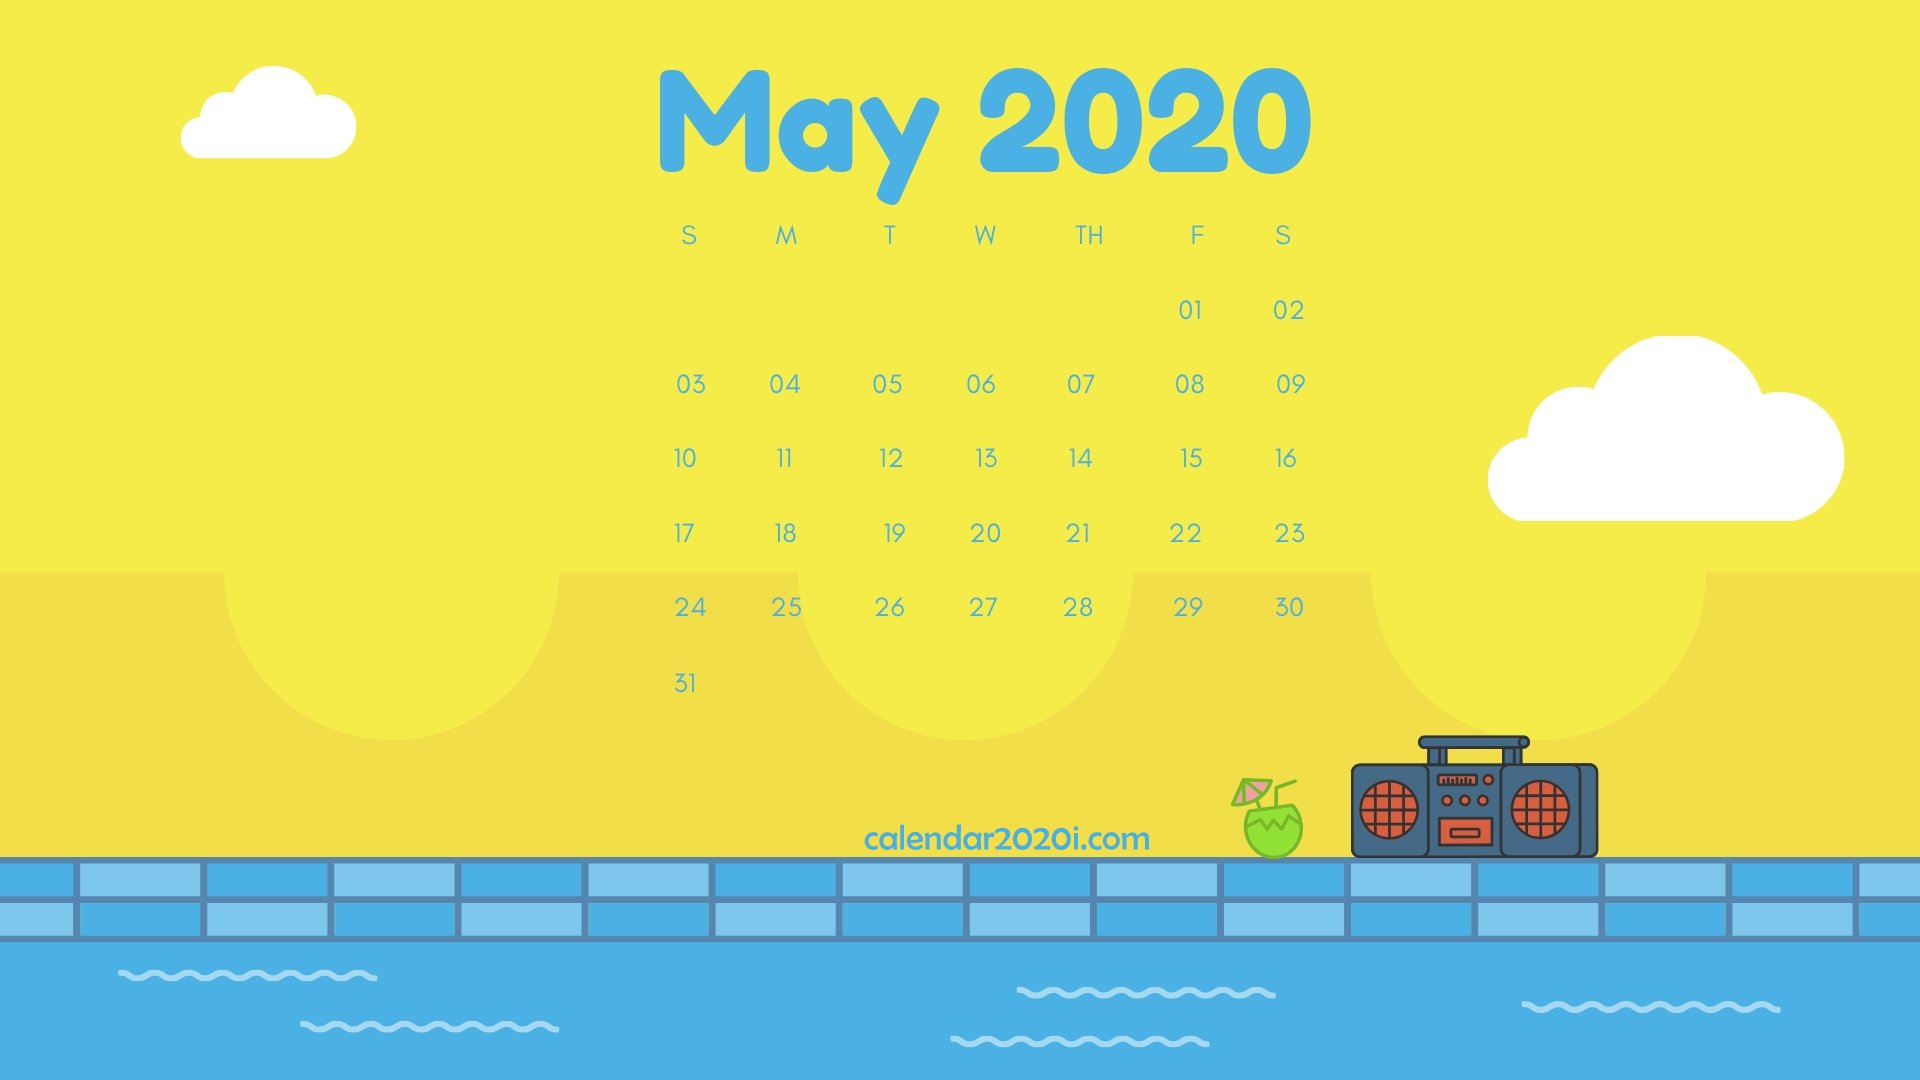 May 2020 Calendar Desktop Wallpaper